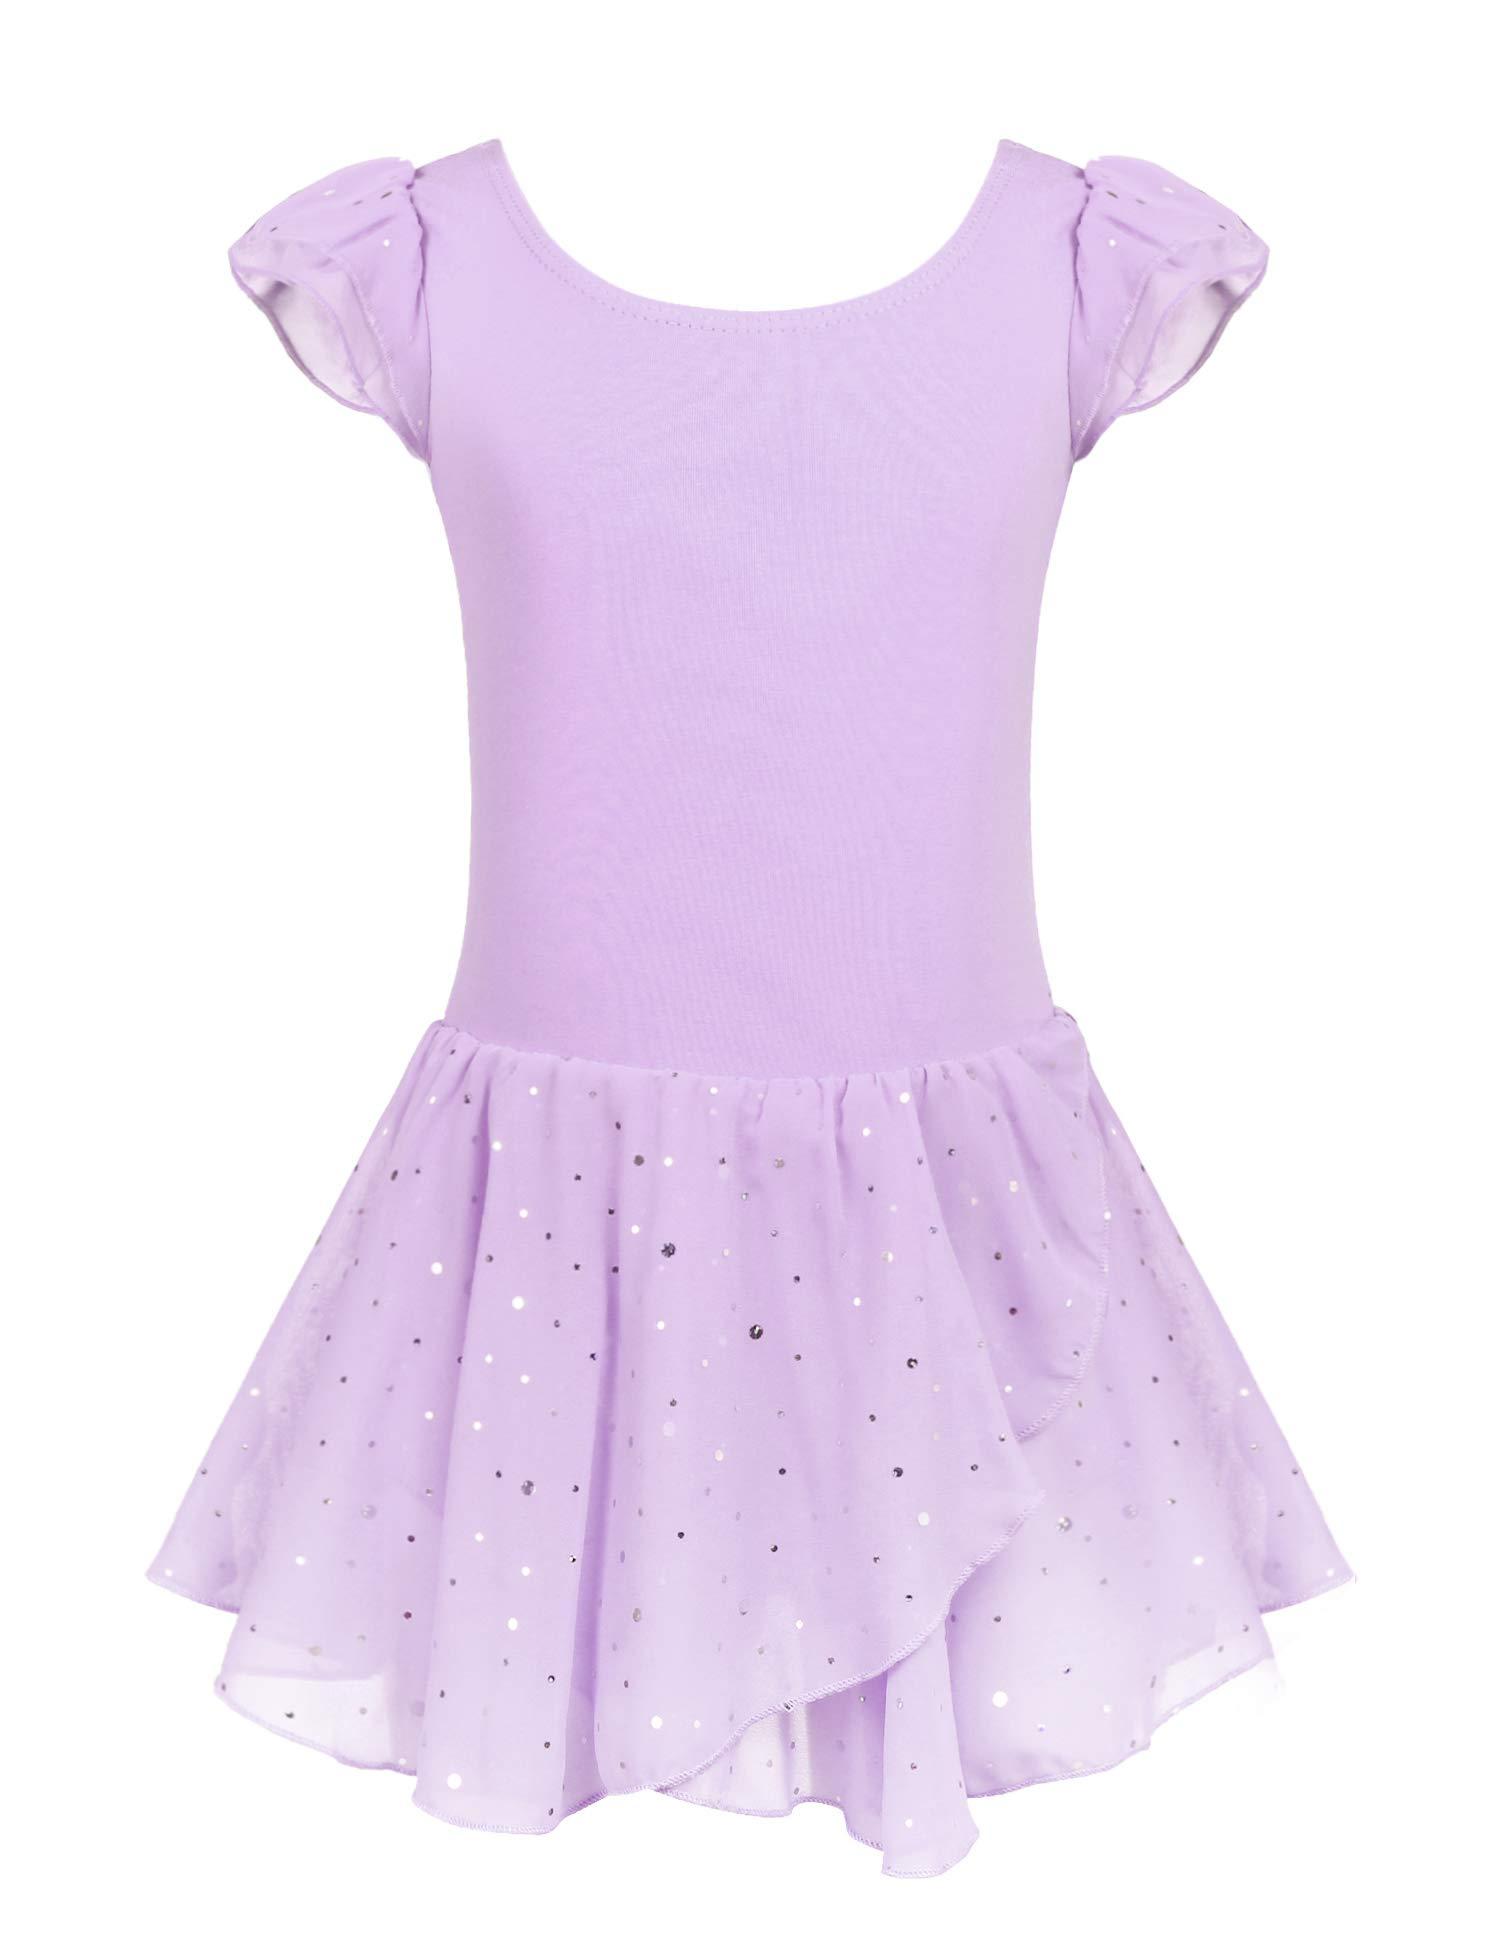 Arshiner Girls Ruffle Sleeve Ballet Dance Dress Tutu Skirted Leotard Lilac